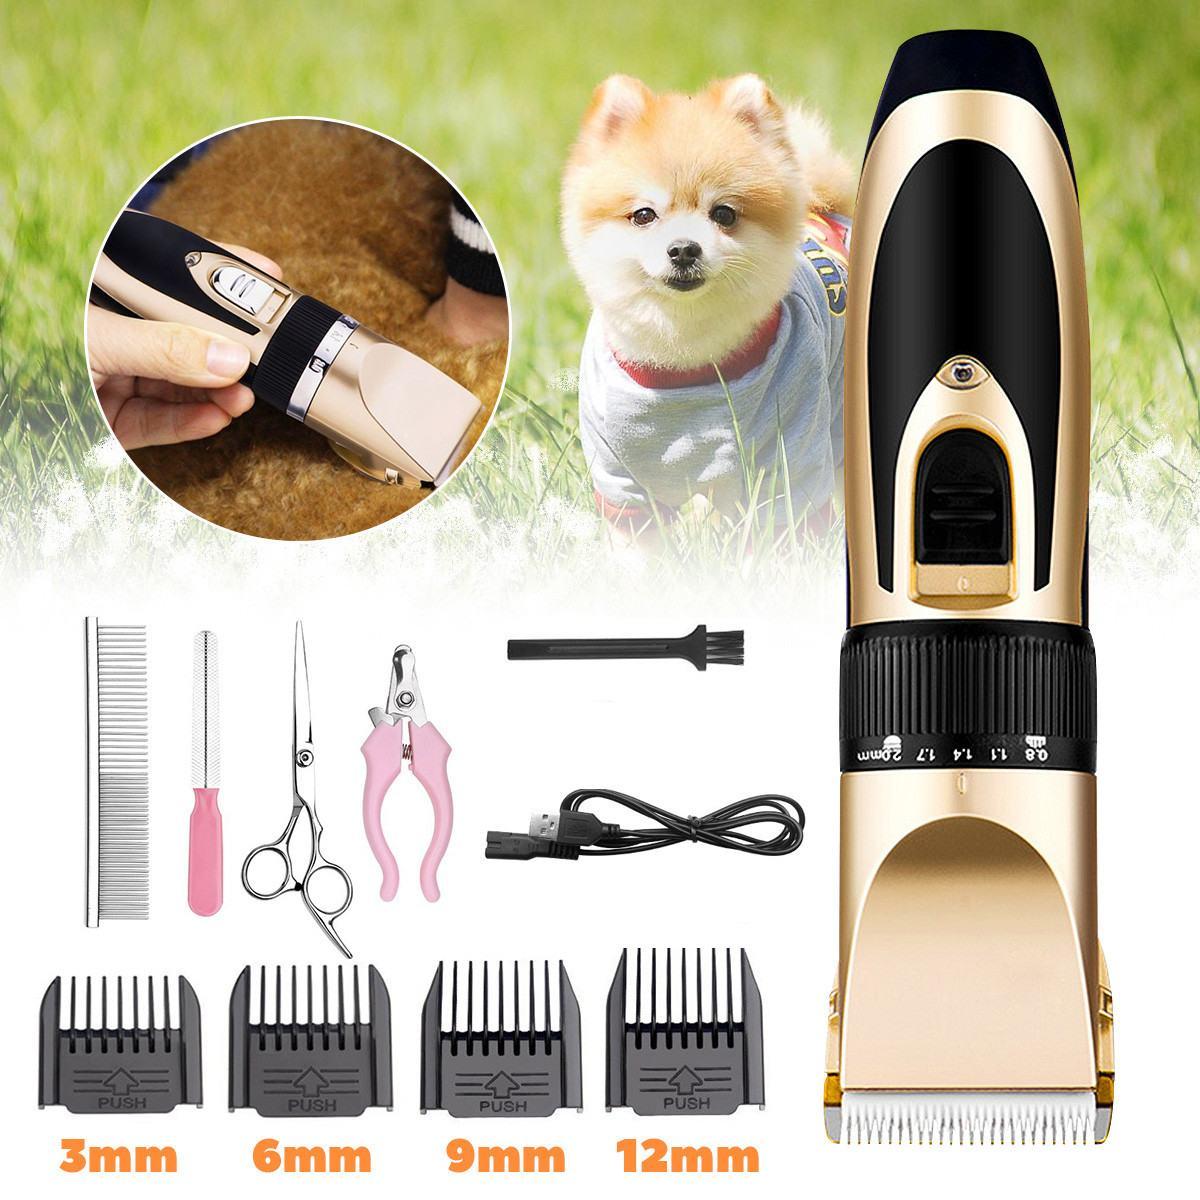 Cortadora profesional de pelo para perros y mascotas, cortadora de pelo para animales, máquina cortadora sin cable, cortadora eléctrica de tijera recargable